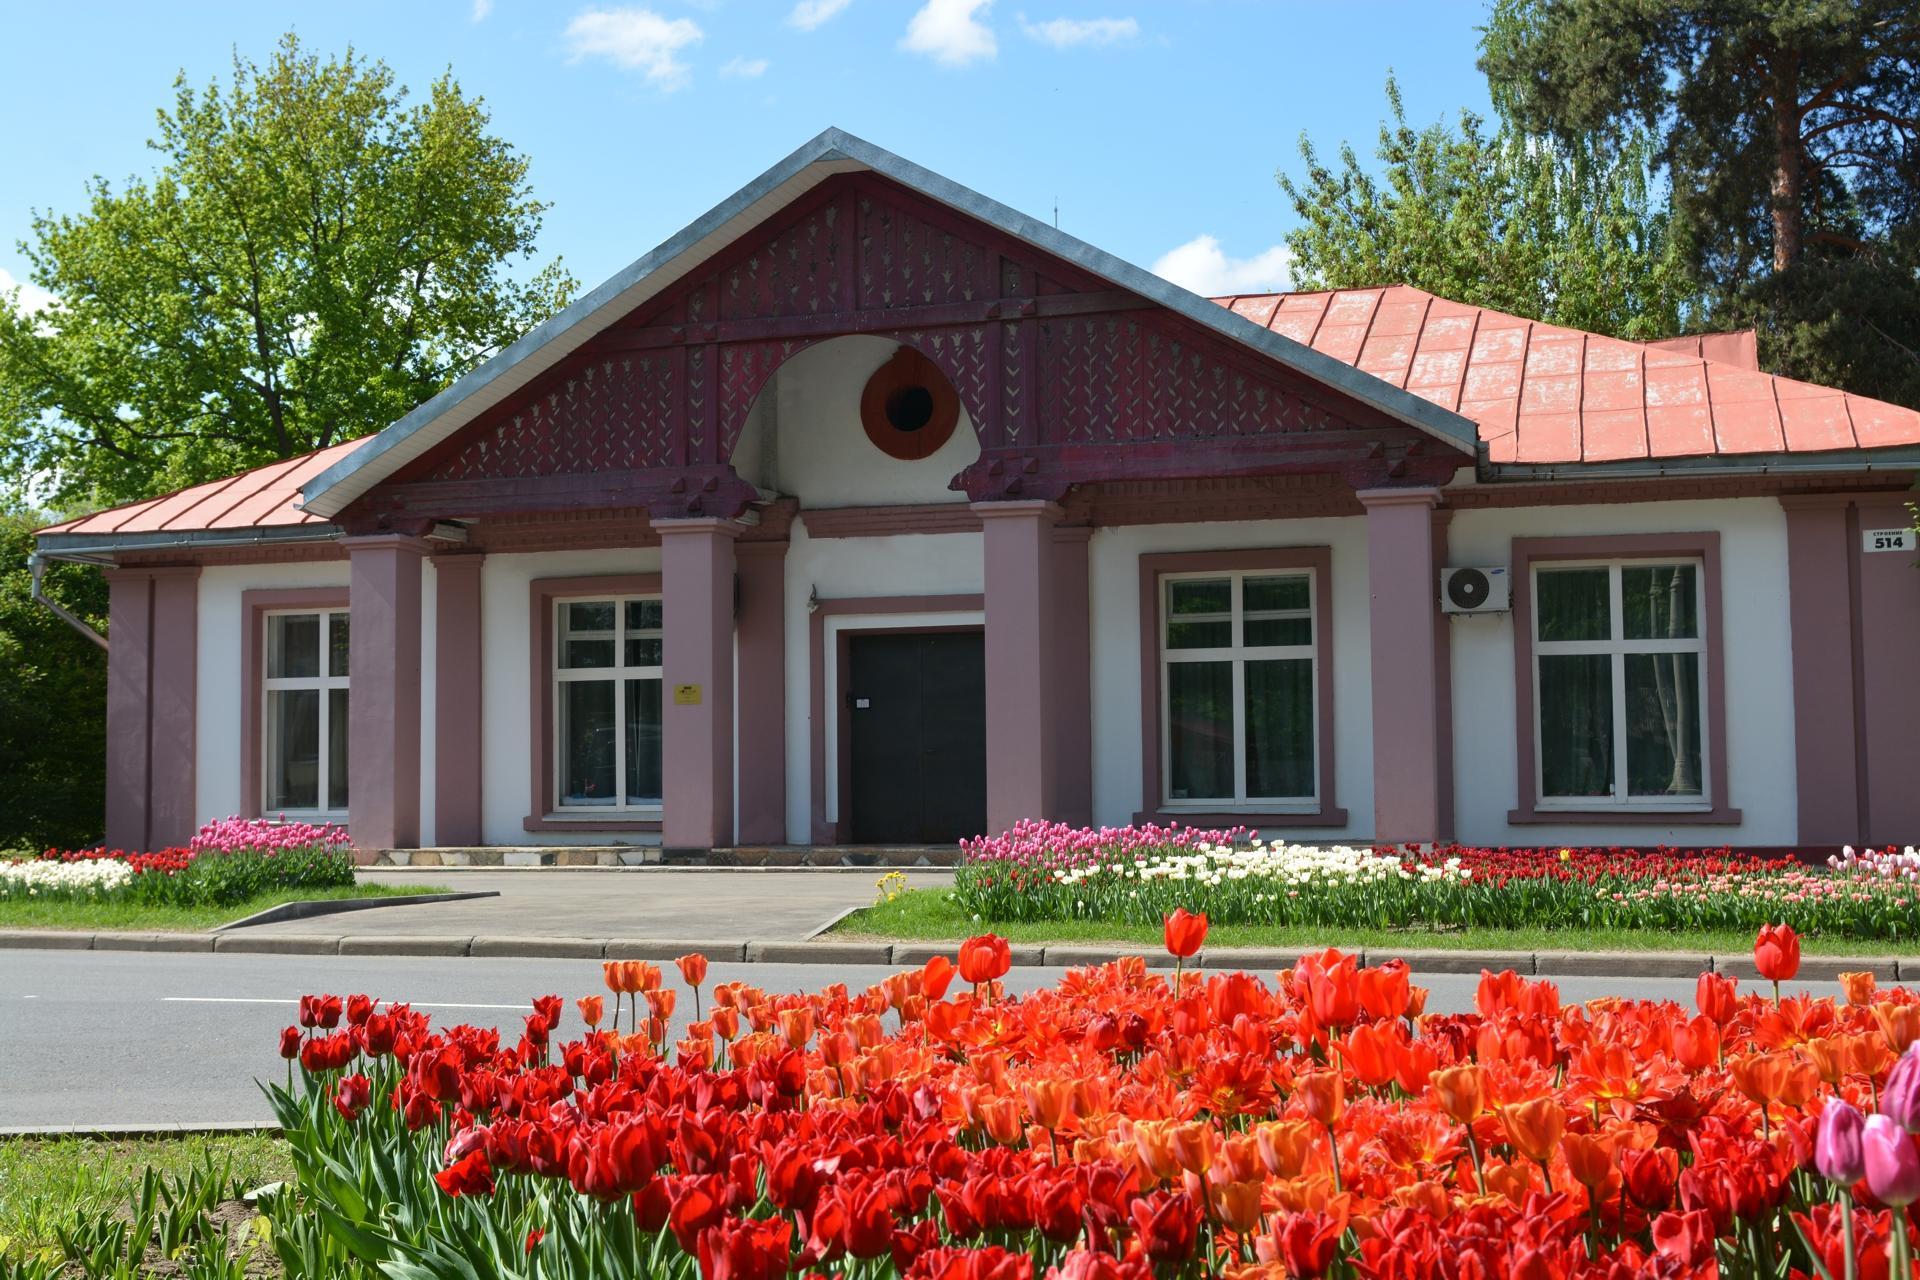 Hostel Tsiolkovsky on VDNKh, North-Eastern